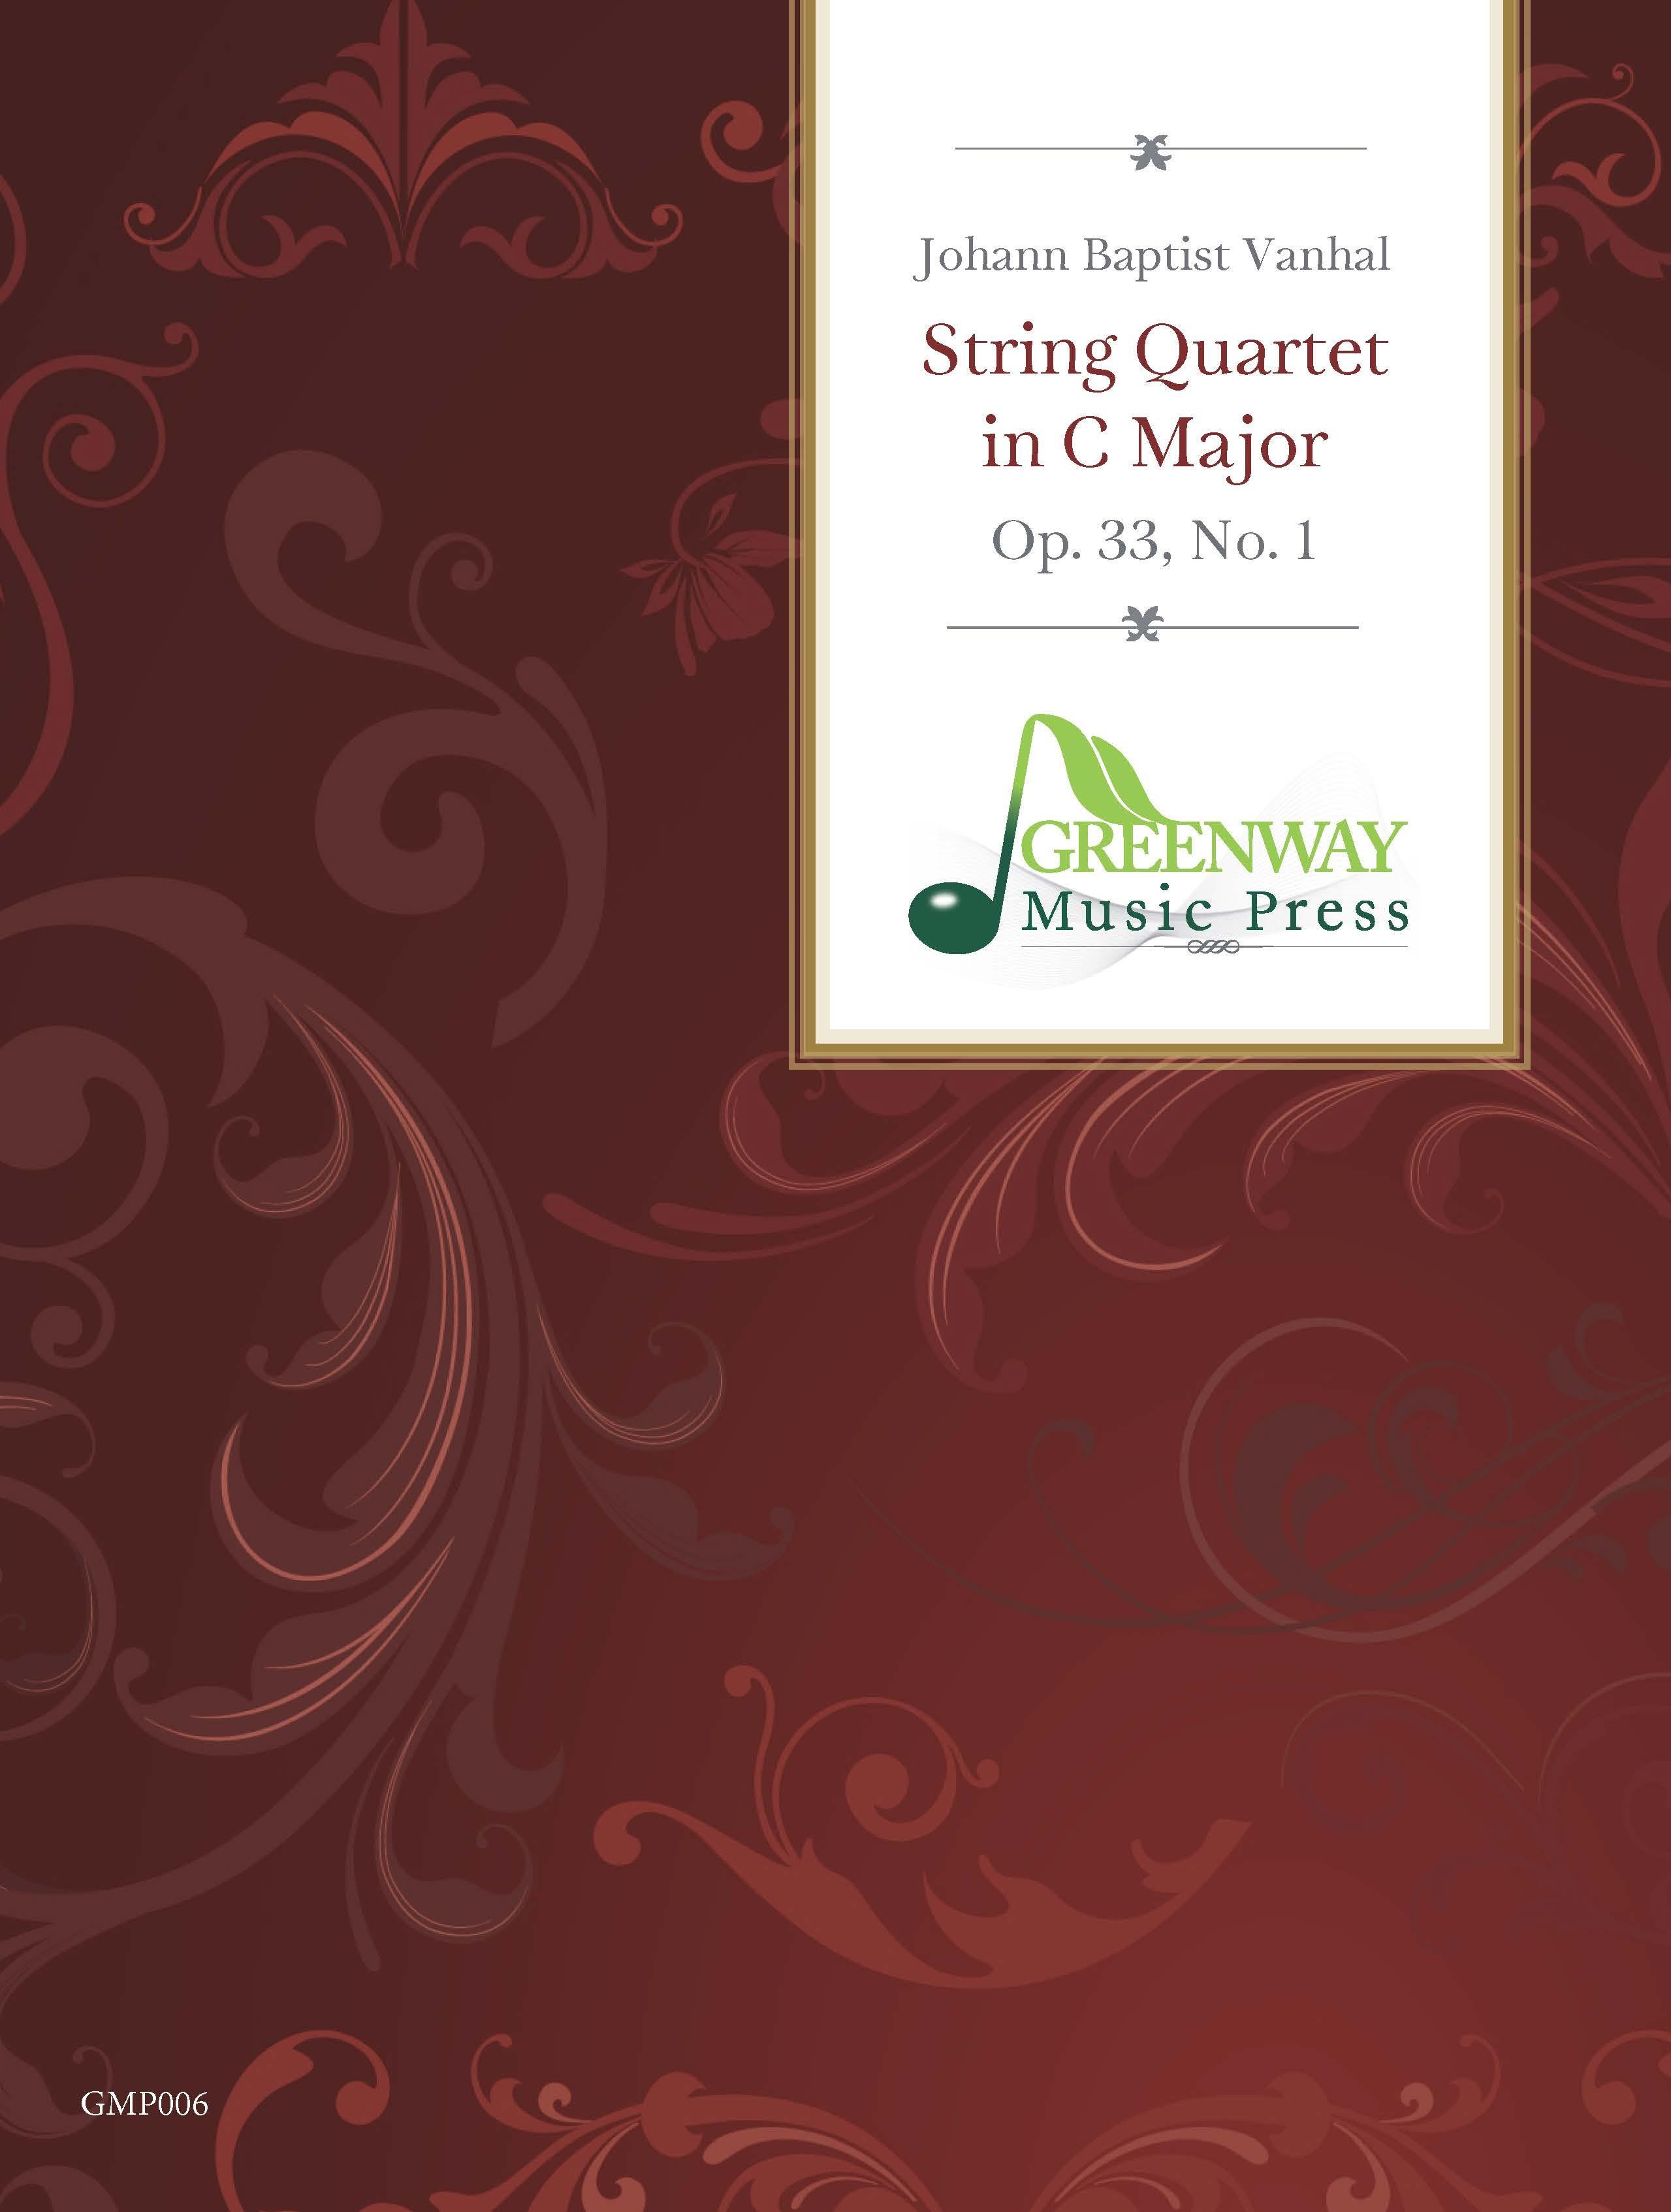 Vanhal: String Quartet in C Major, Op. 33, No. 1